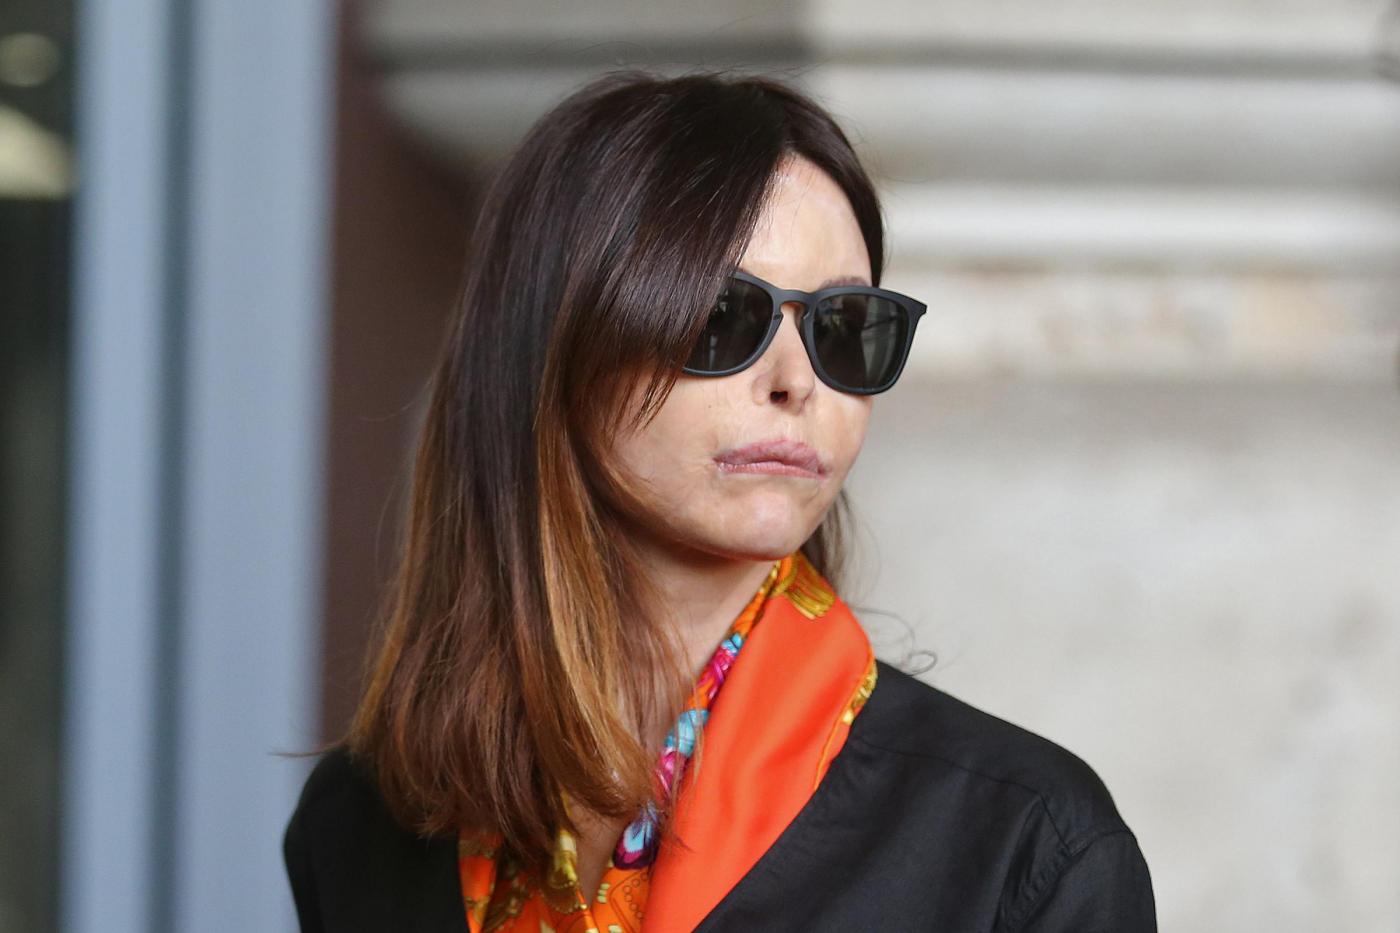 Lucia Annibali arriva in Cassazione